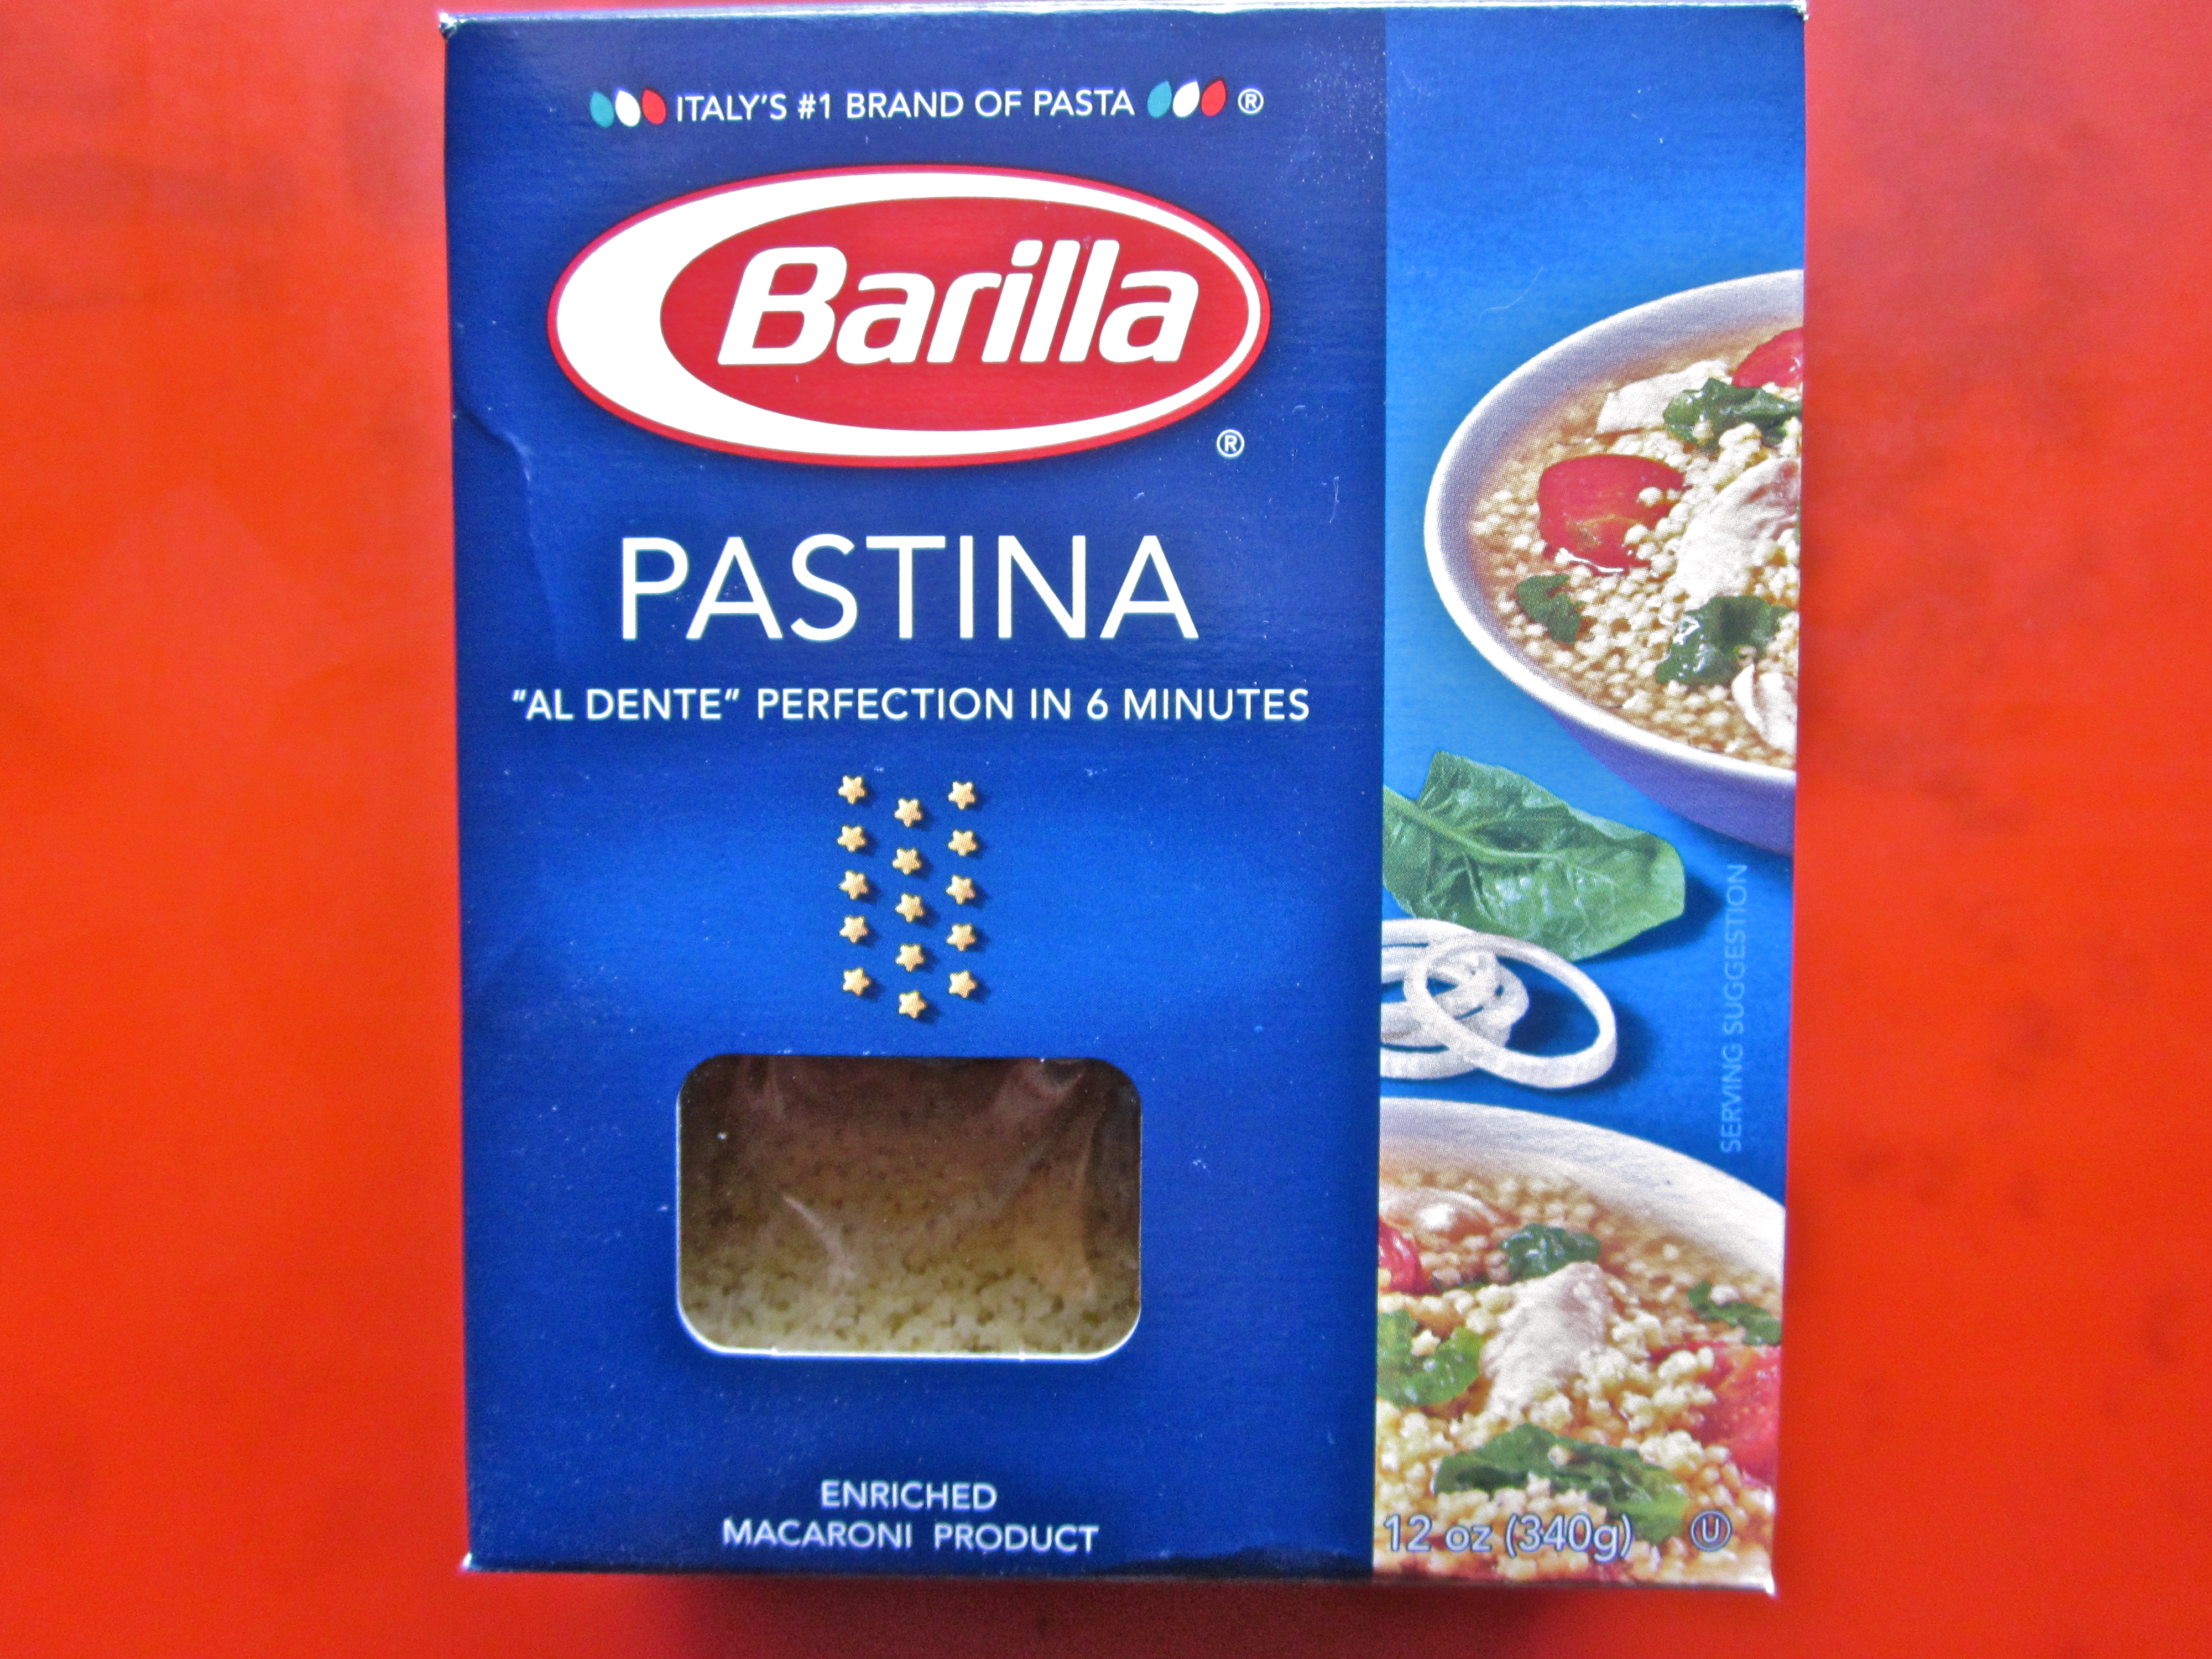 springtime italian wedding soup lauren loves good food